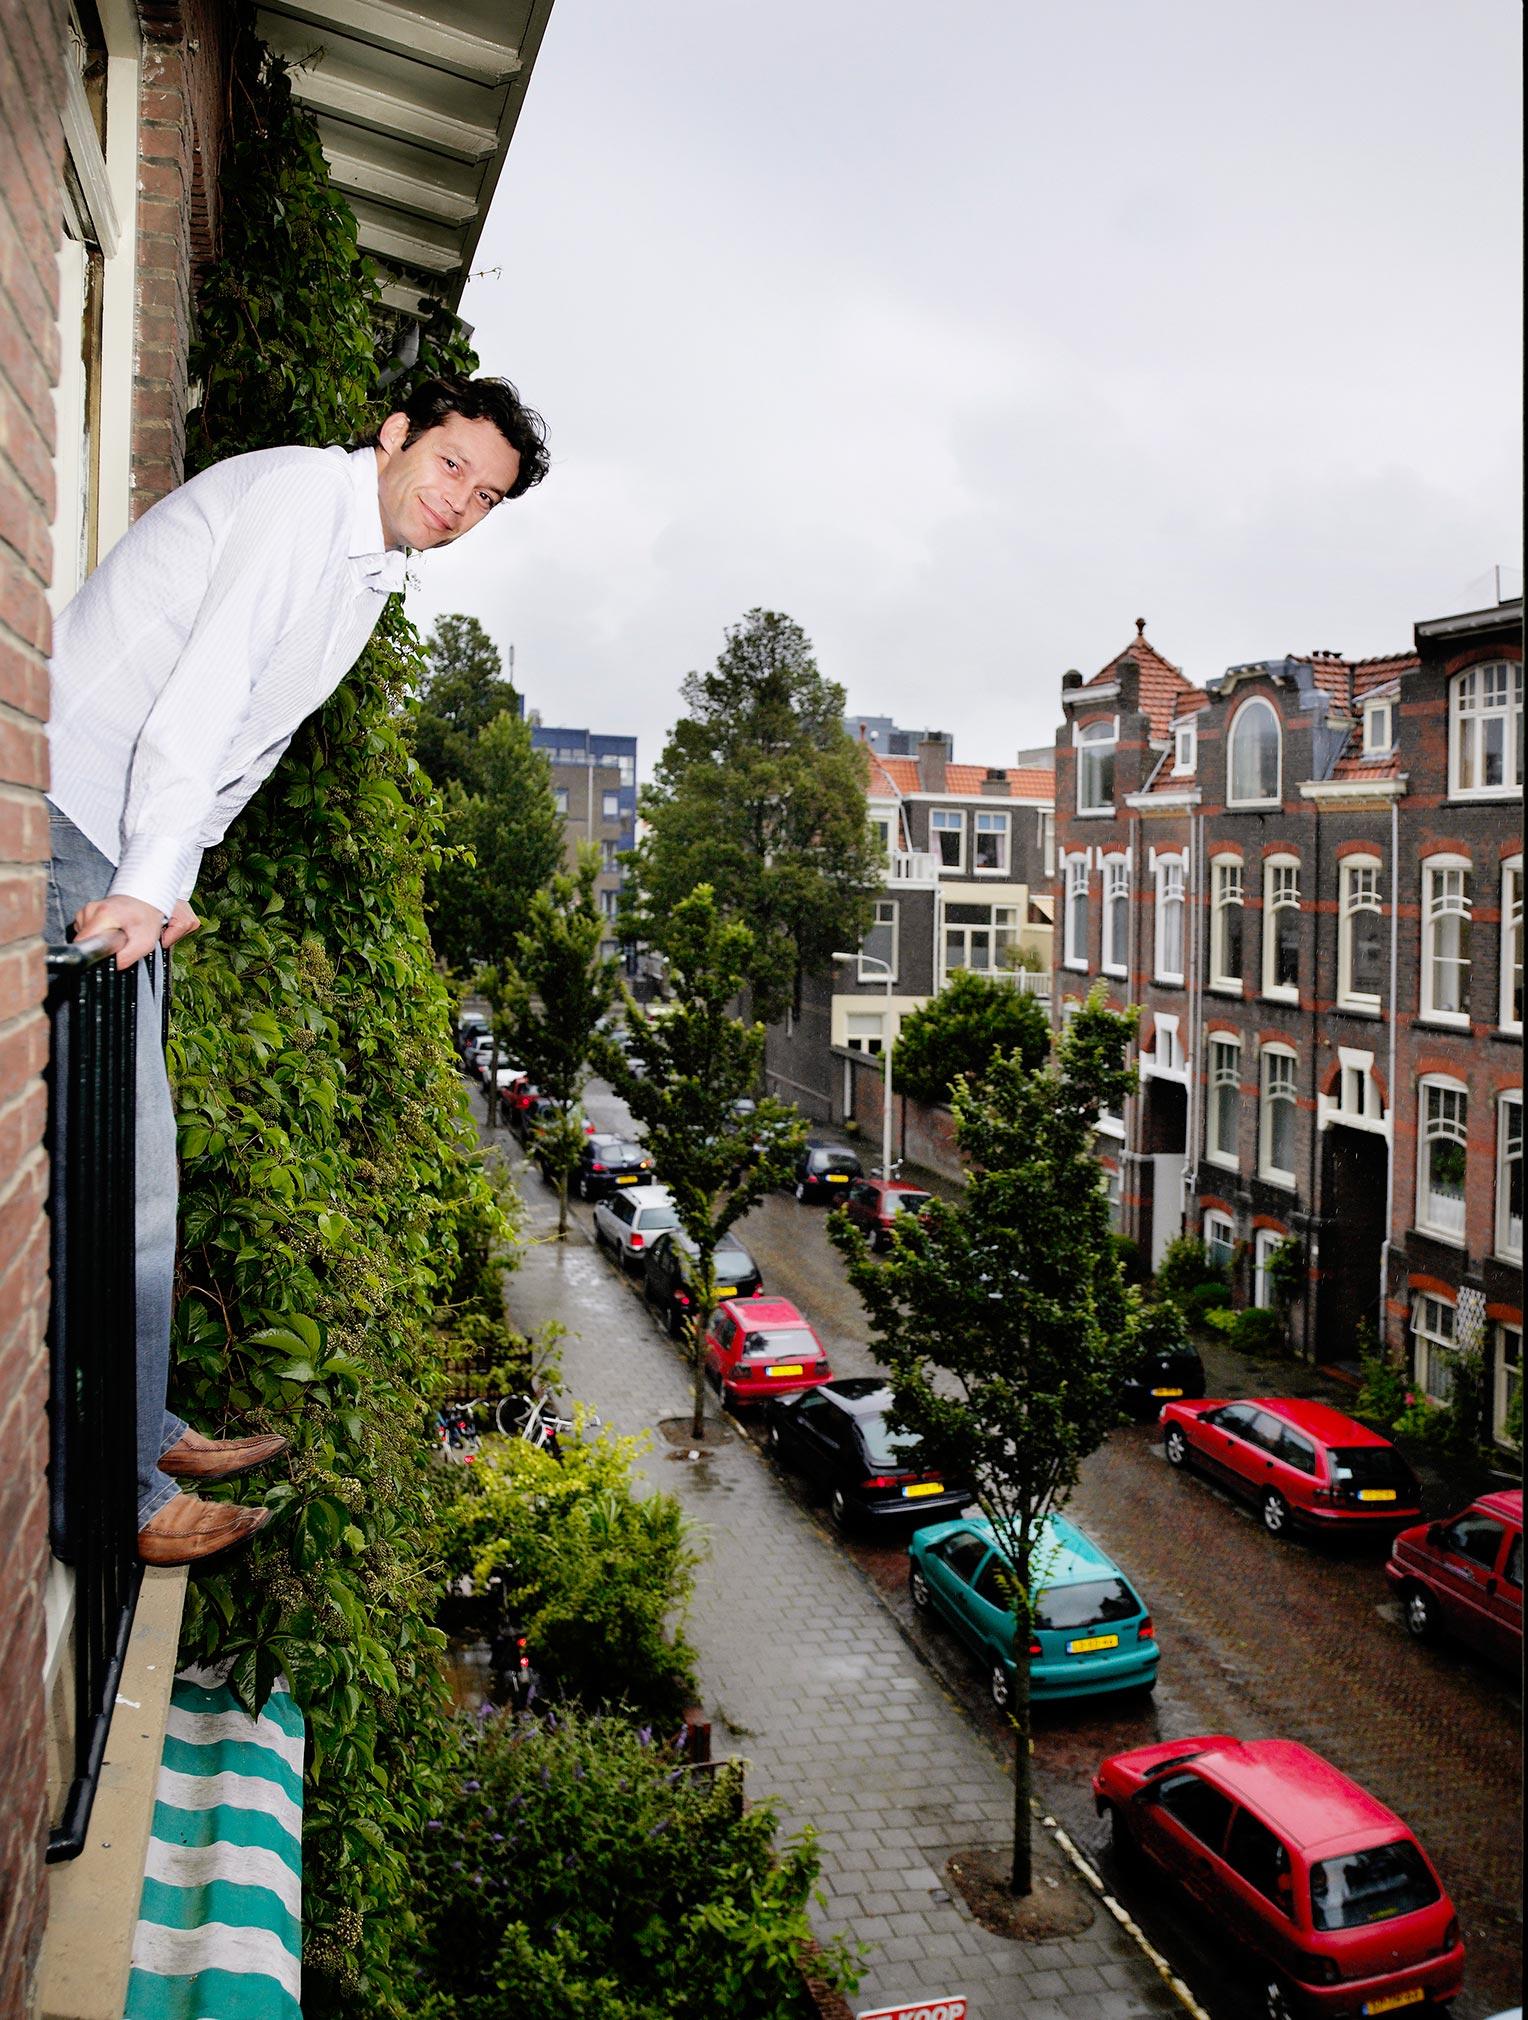 Joost Karhof, Esta>2008